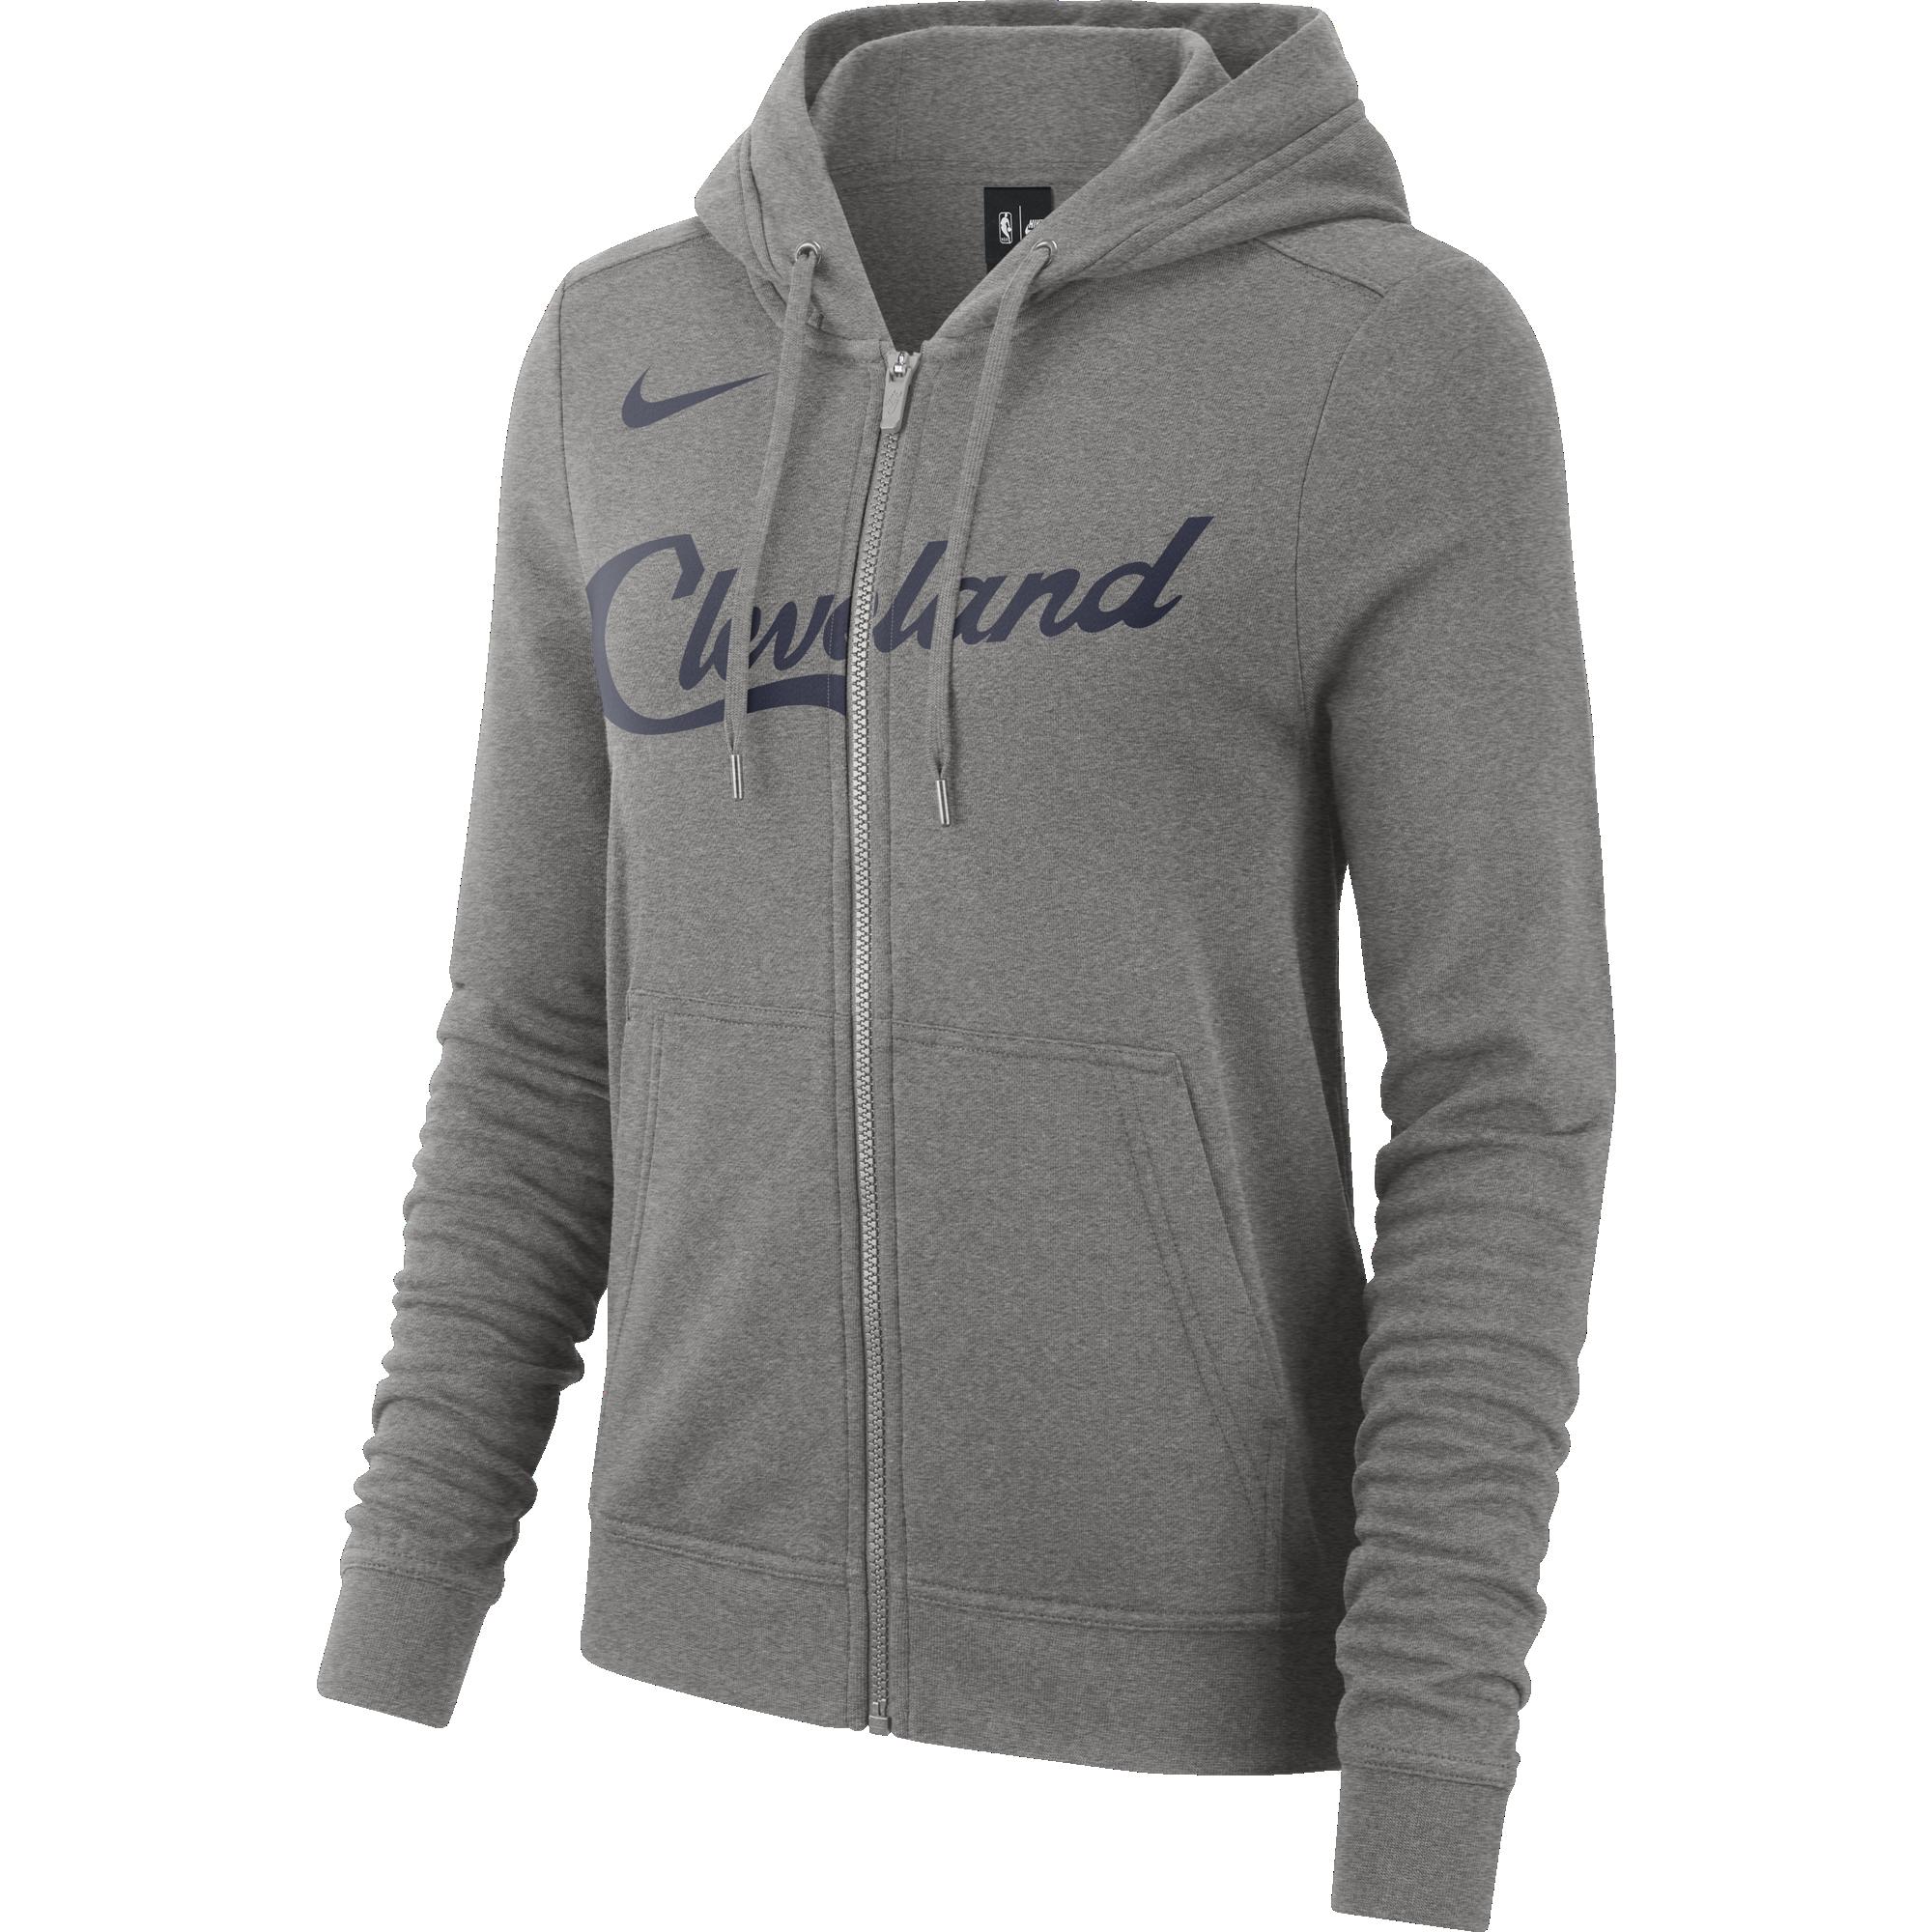 Cleveland Cavaliers Nike Women s Earned Edition Full-Zip Hoodie for  74.99  Fanatics 8d679fc6b